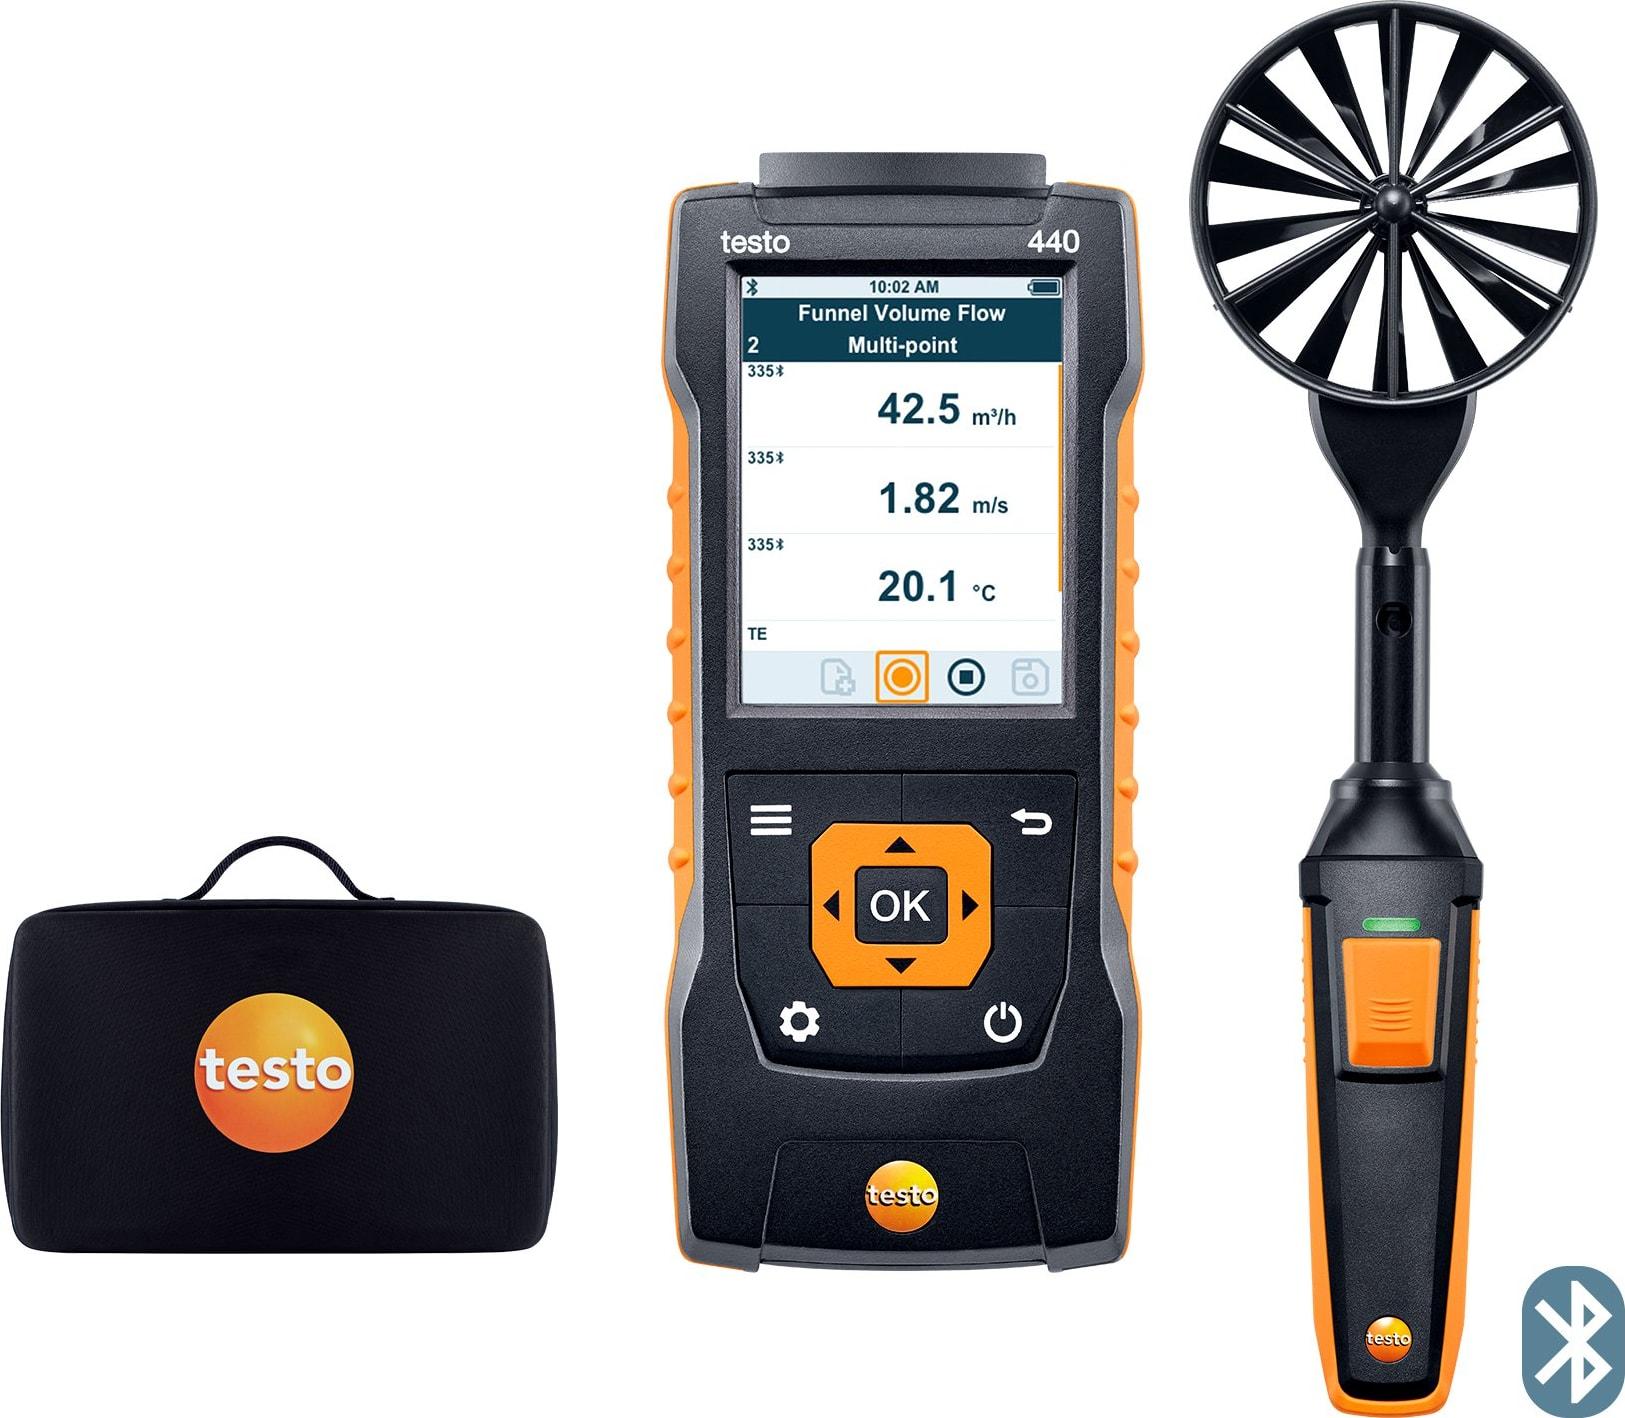 "Testo 440 Vane Kit with Bluetooth (3.9"", 100mm) - Part Number 0563 4403"